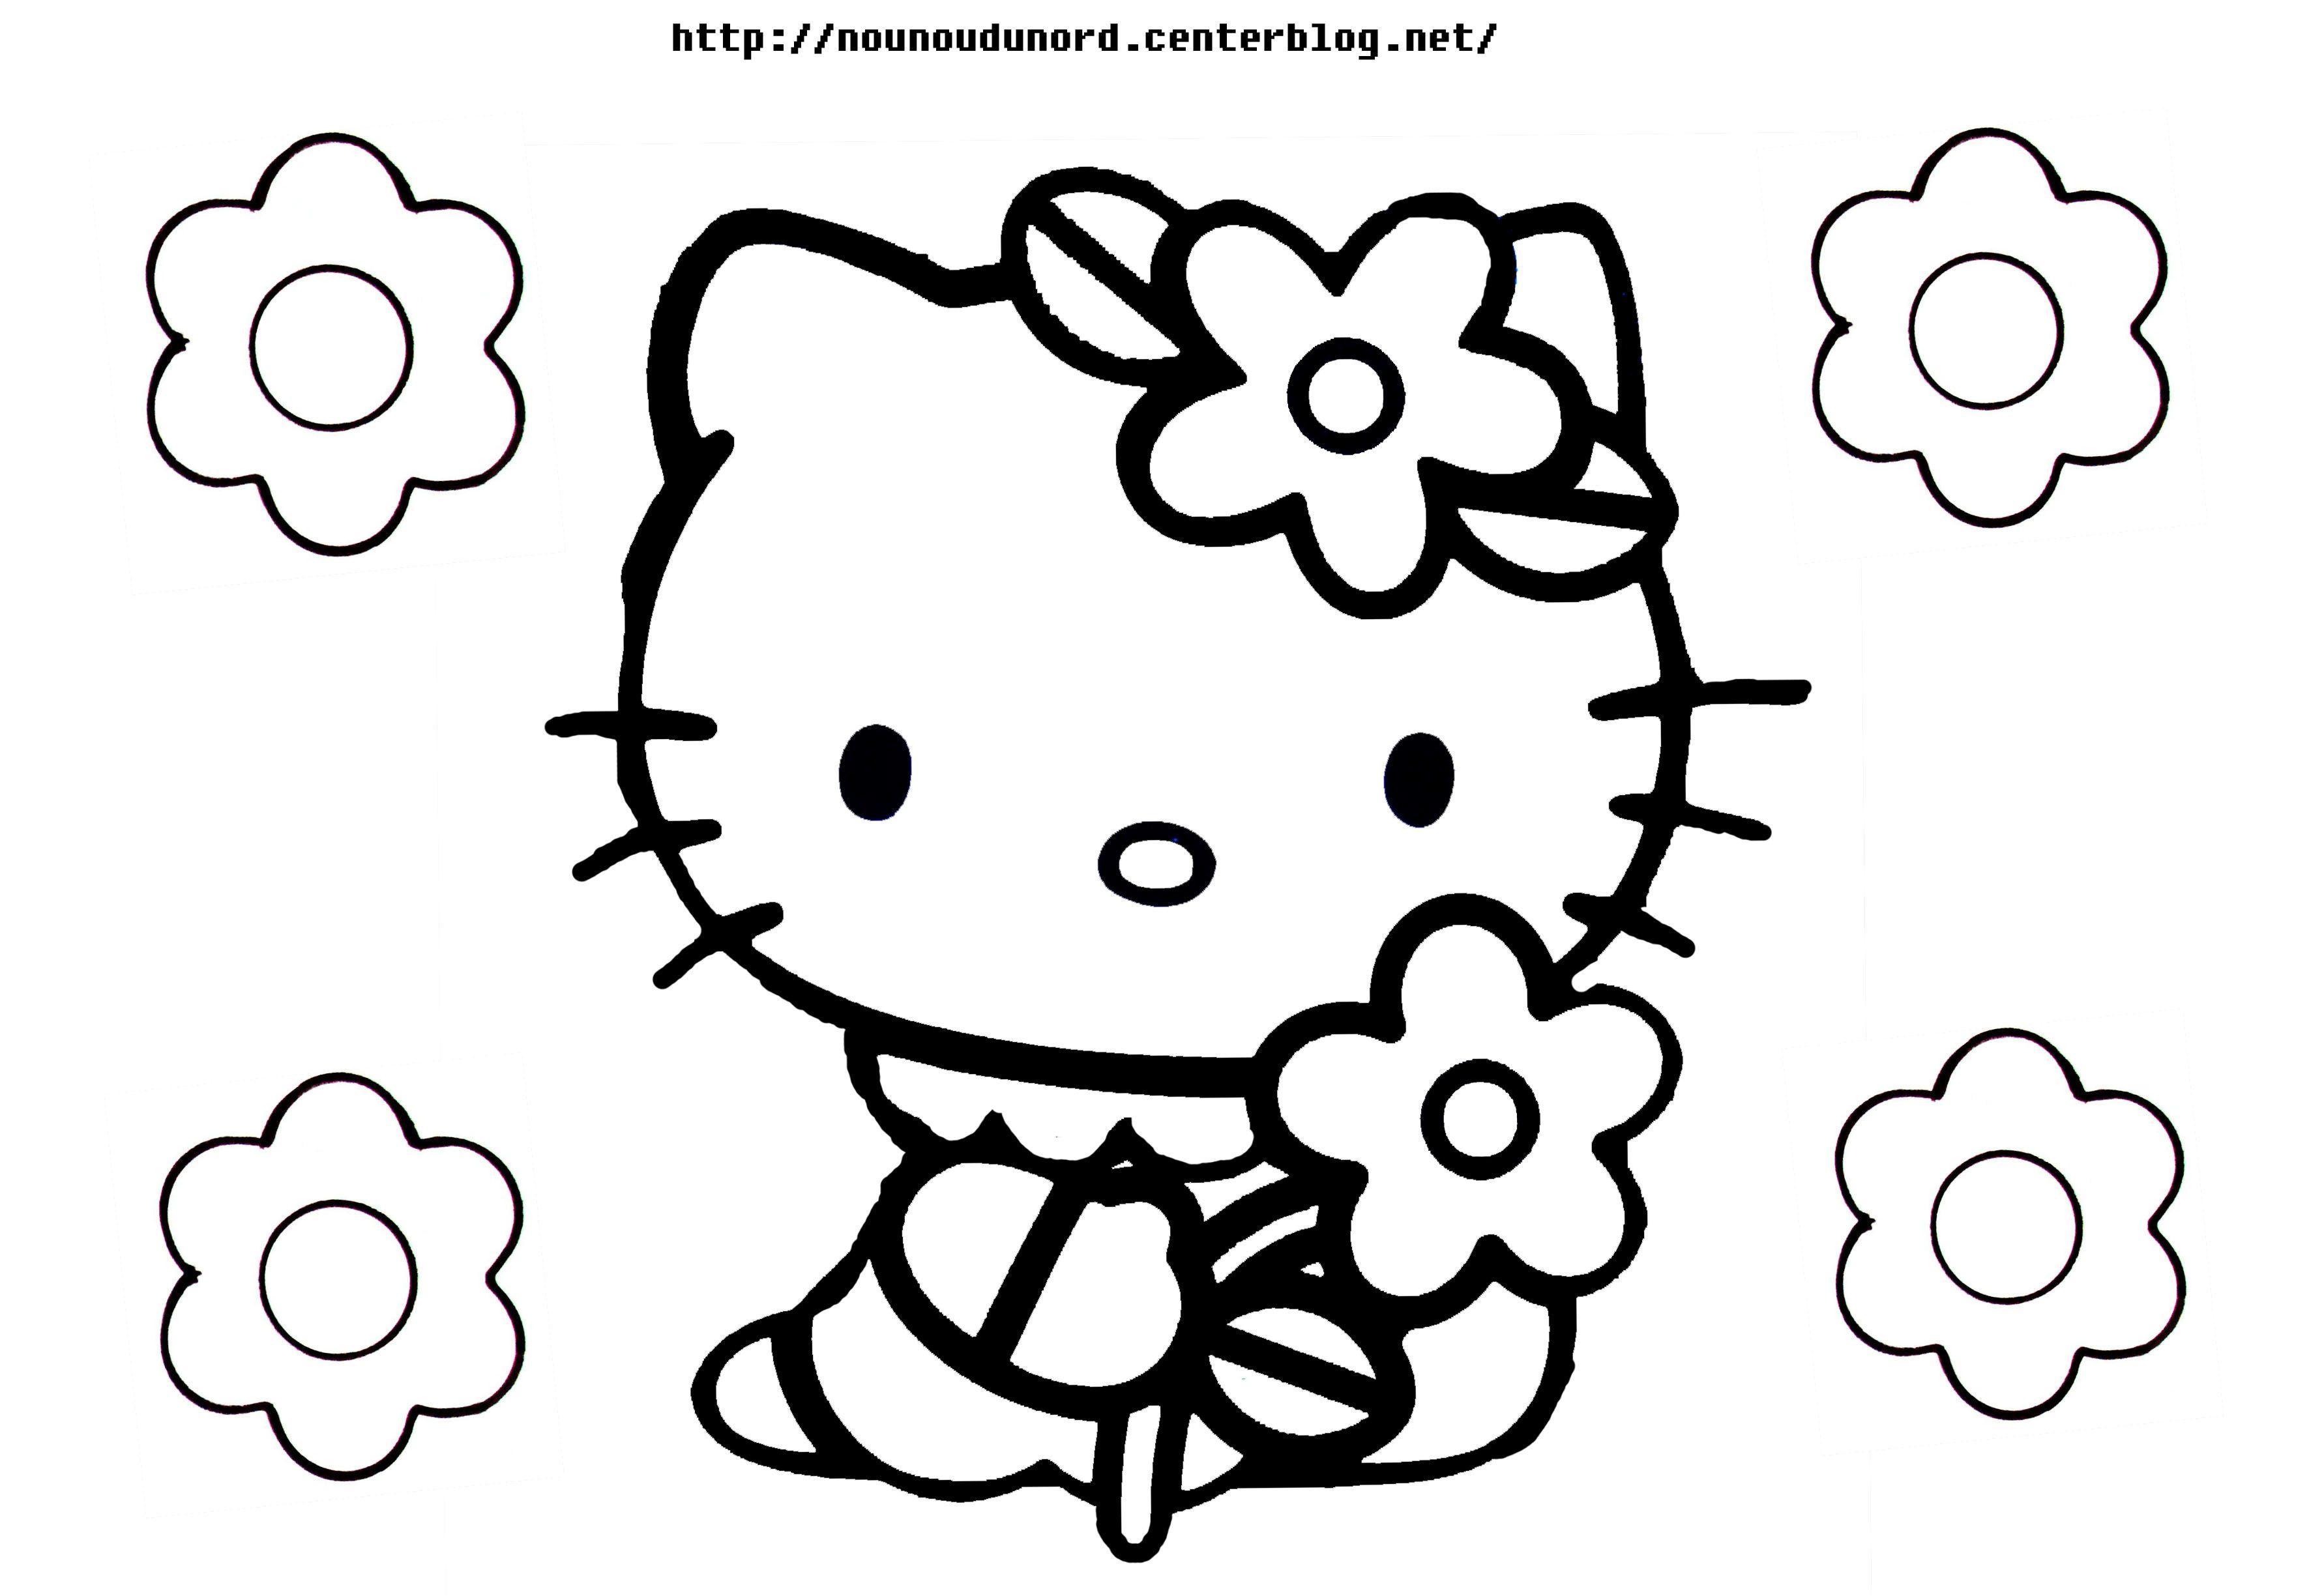 Dessins A Imprimer Raconnat Coloriage Hello Kitty Coloriage A Imprimer Gratuit Coloriage